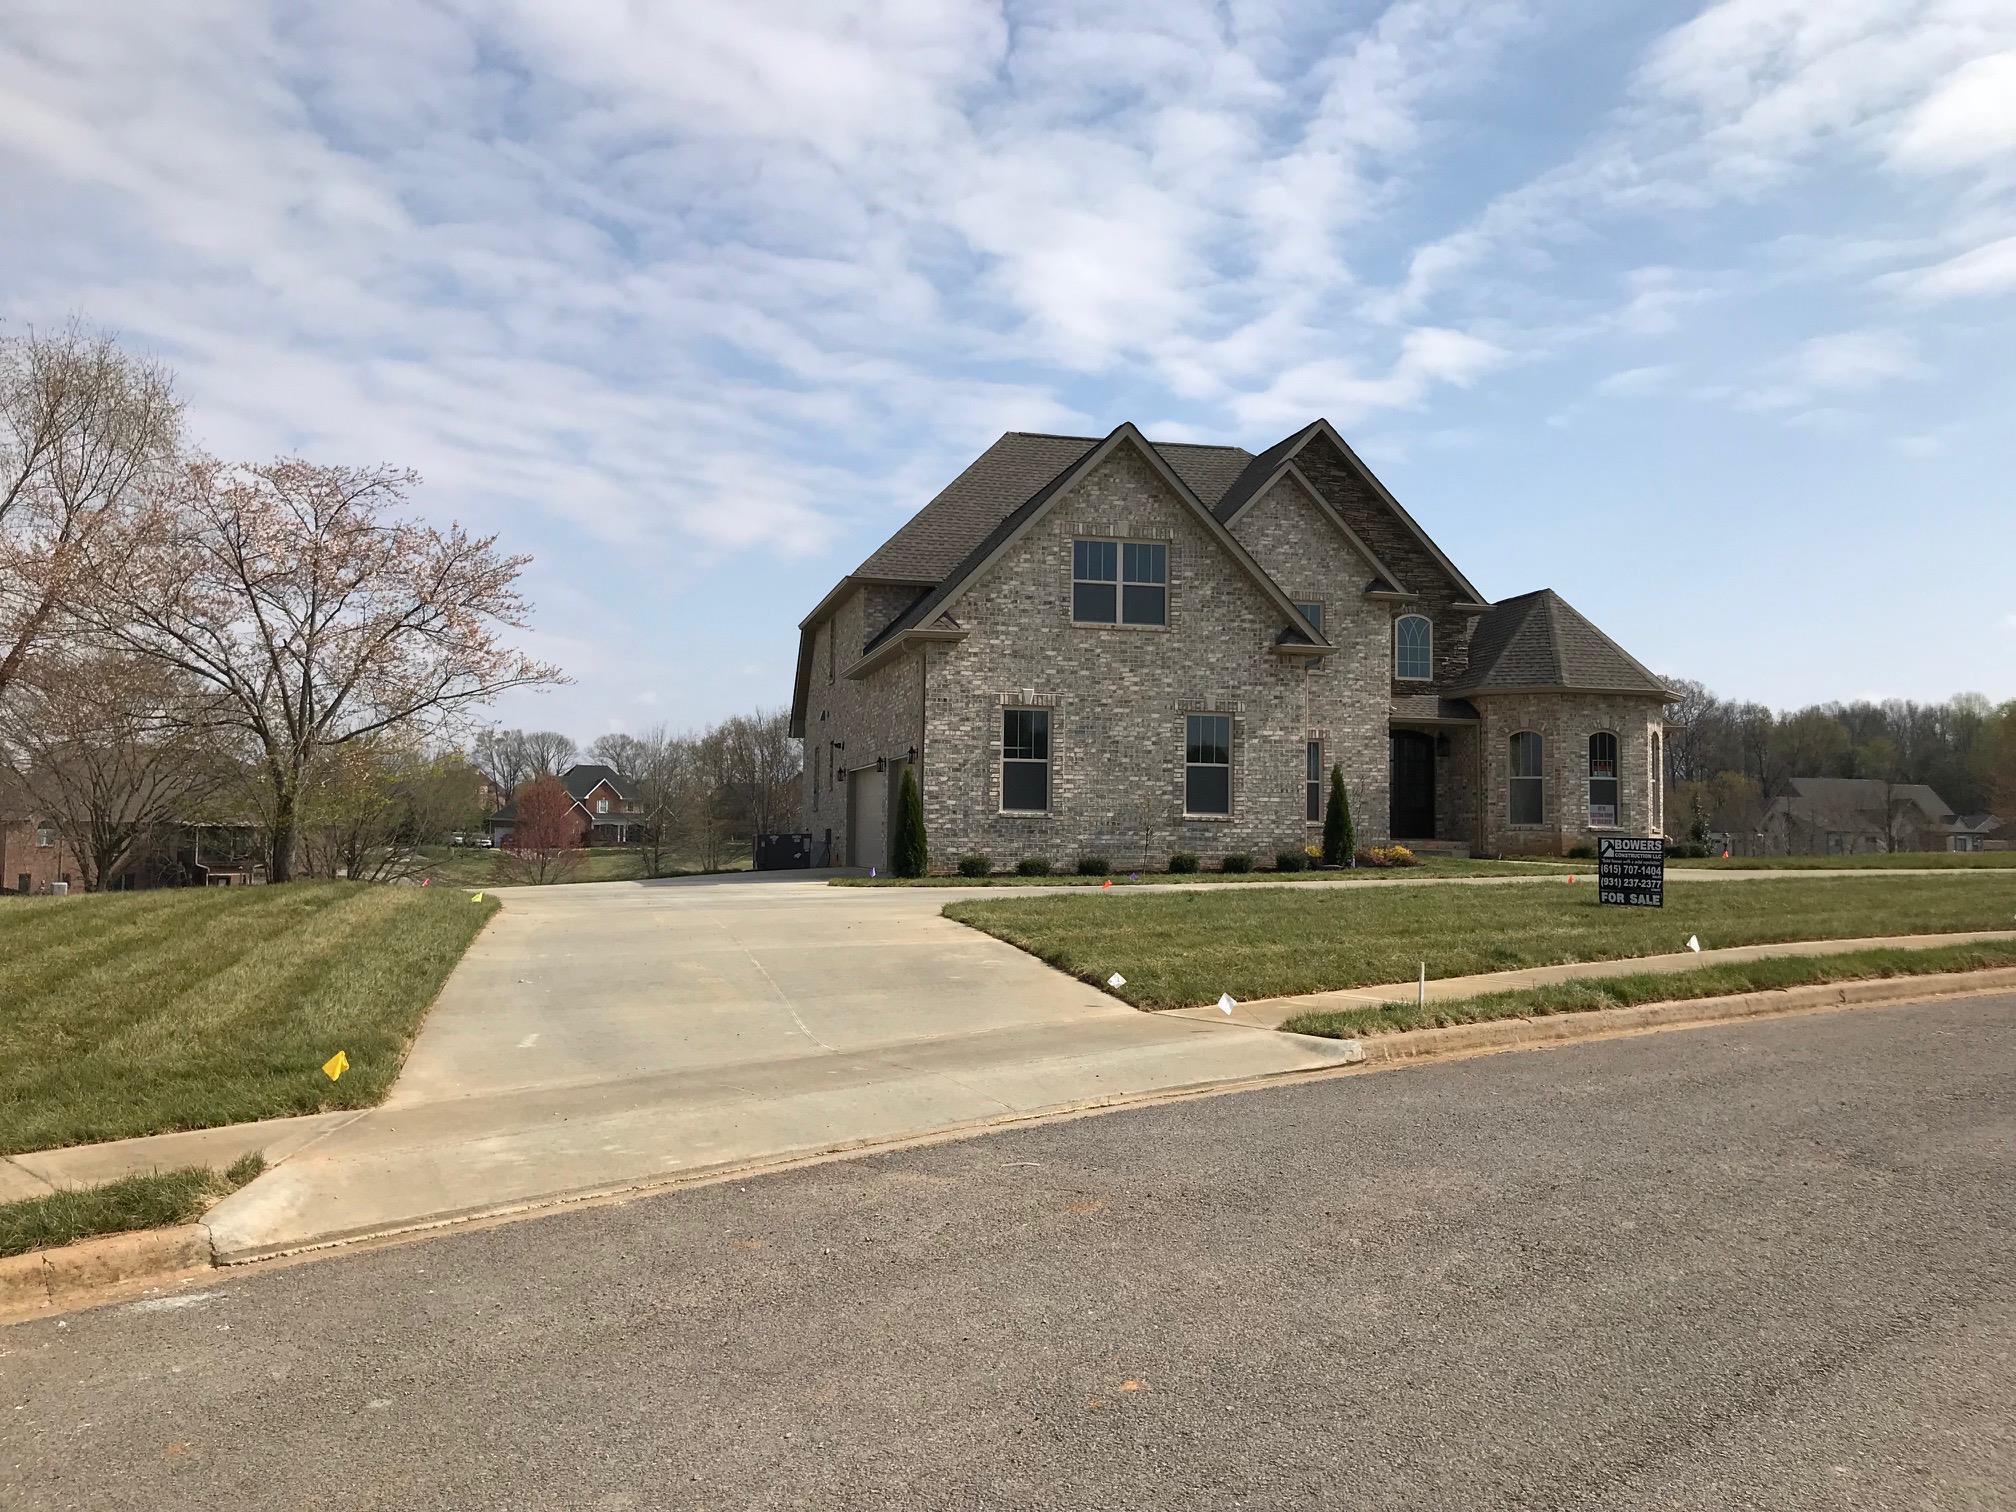 Hardwood floor homes for sale in clarksville real estate for Flooring clarksville tn